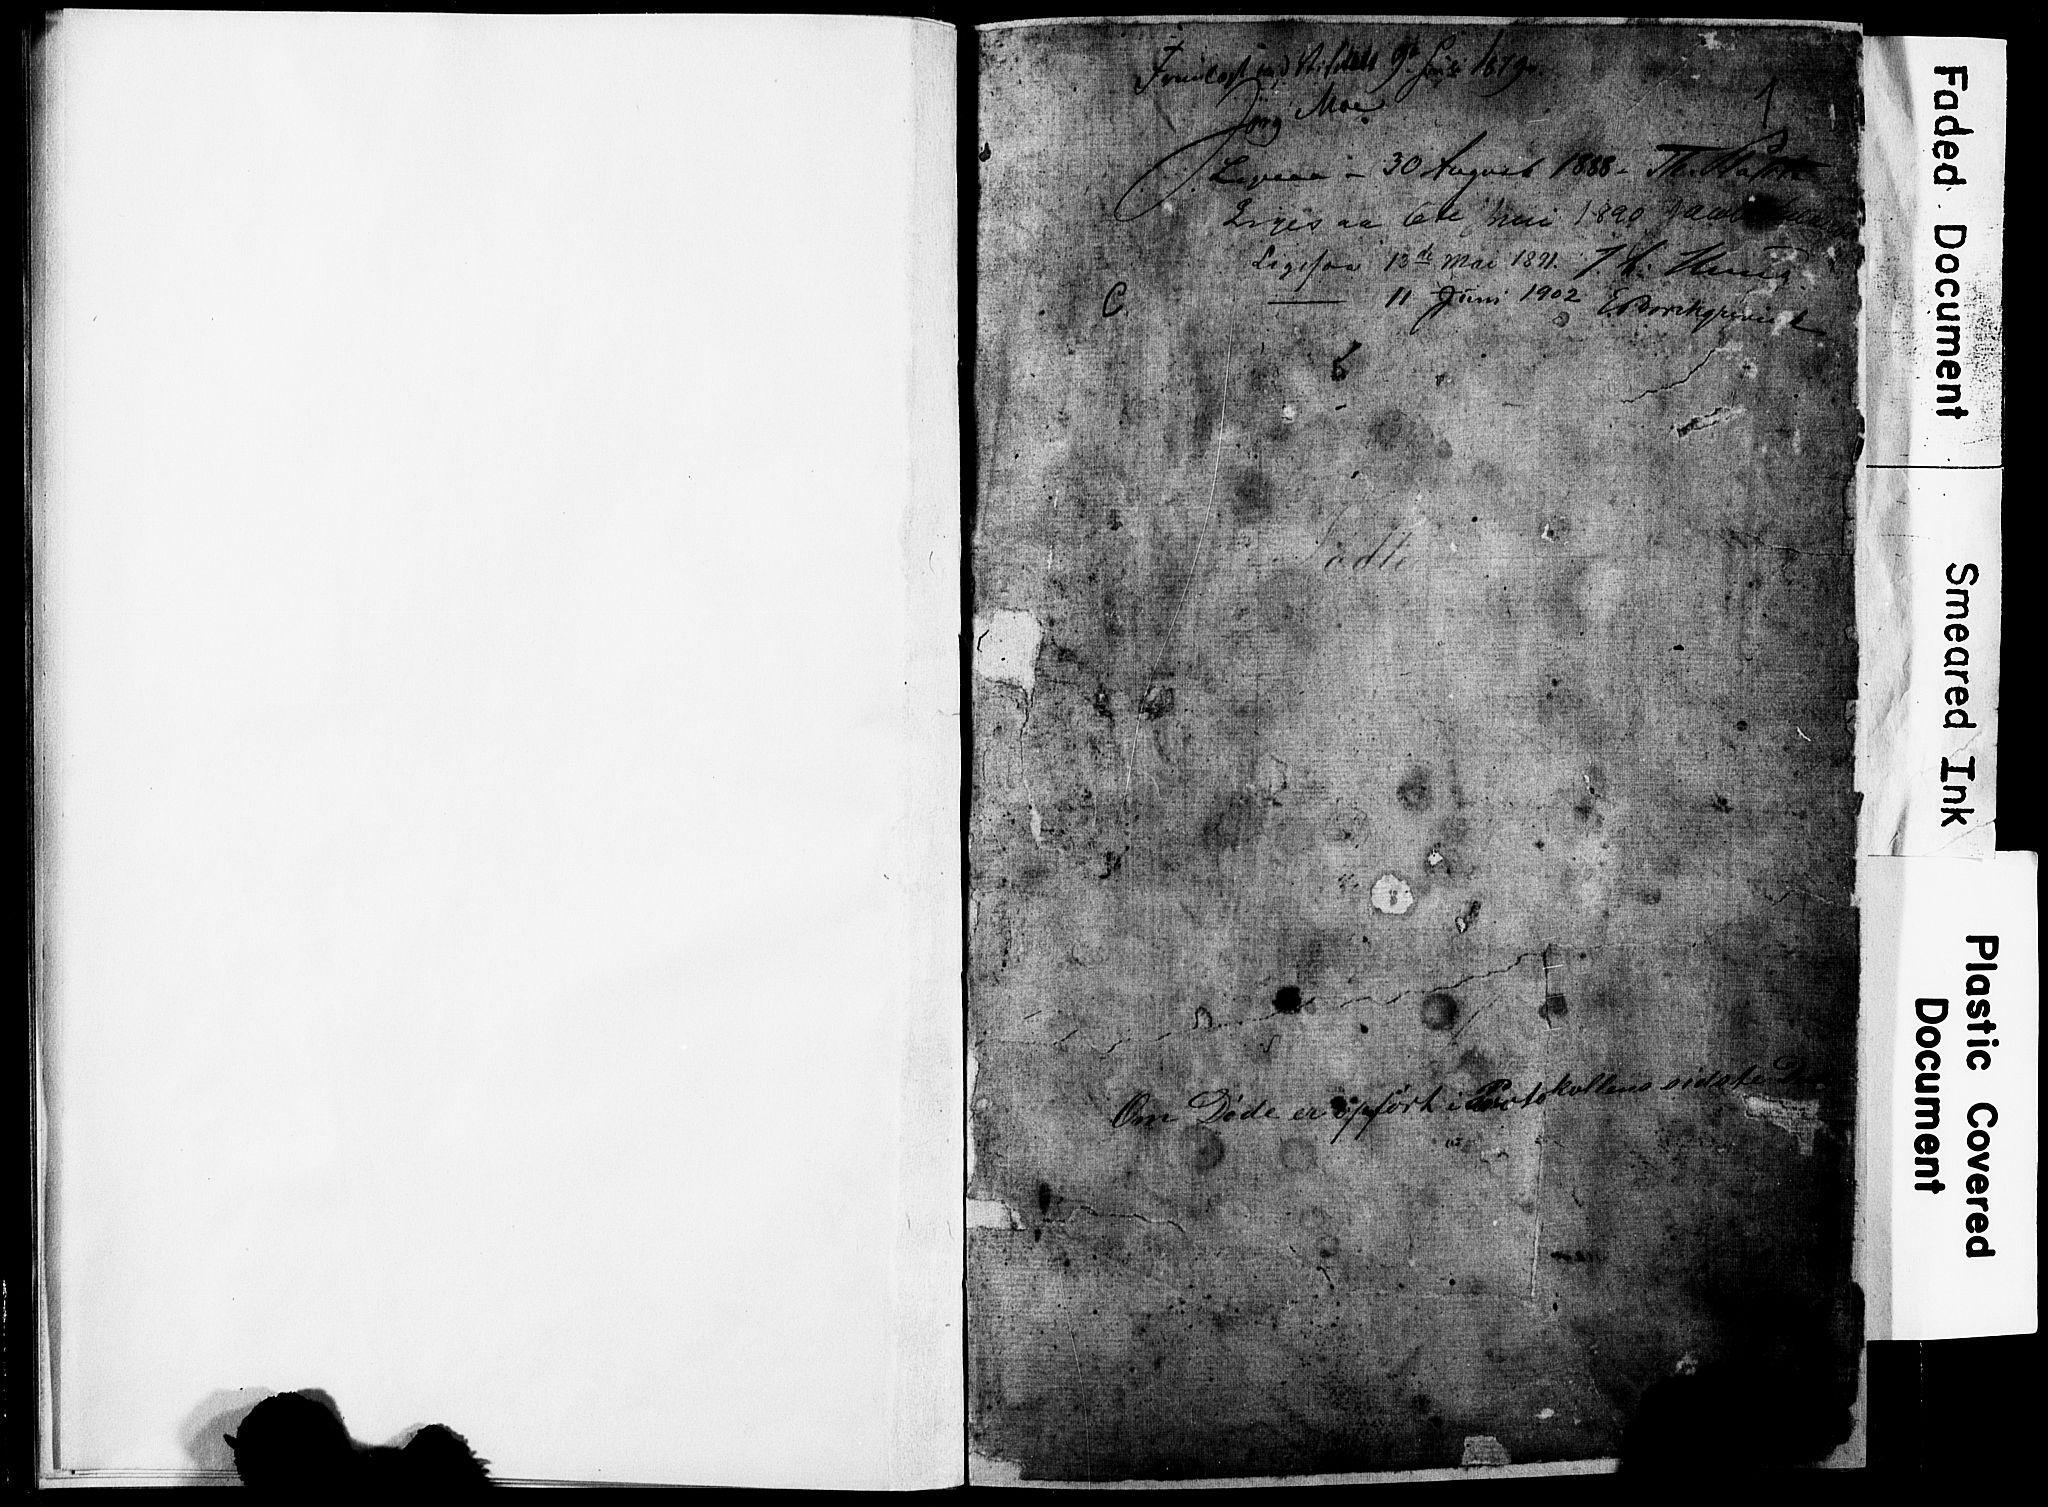 SAST, Torvastad sokneprestkontor, H/Ha/Hab/L0005: Klokkerbok nr. B 5, 1857-1908